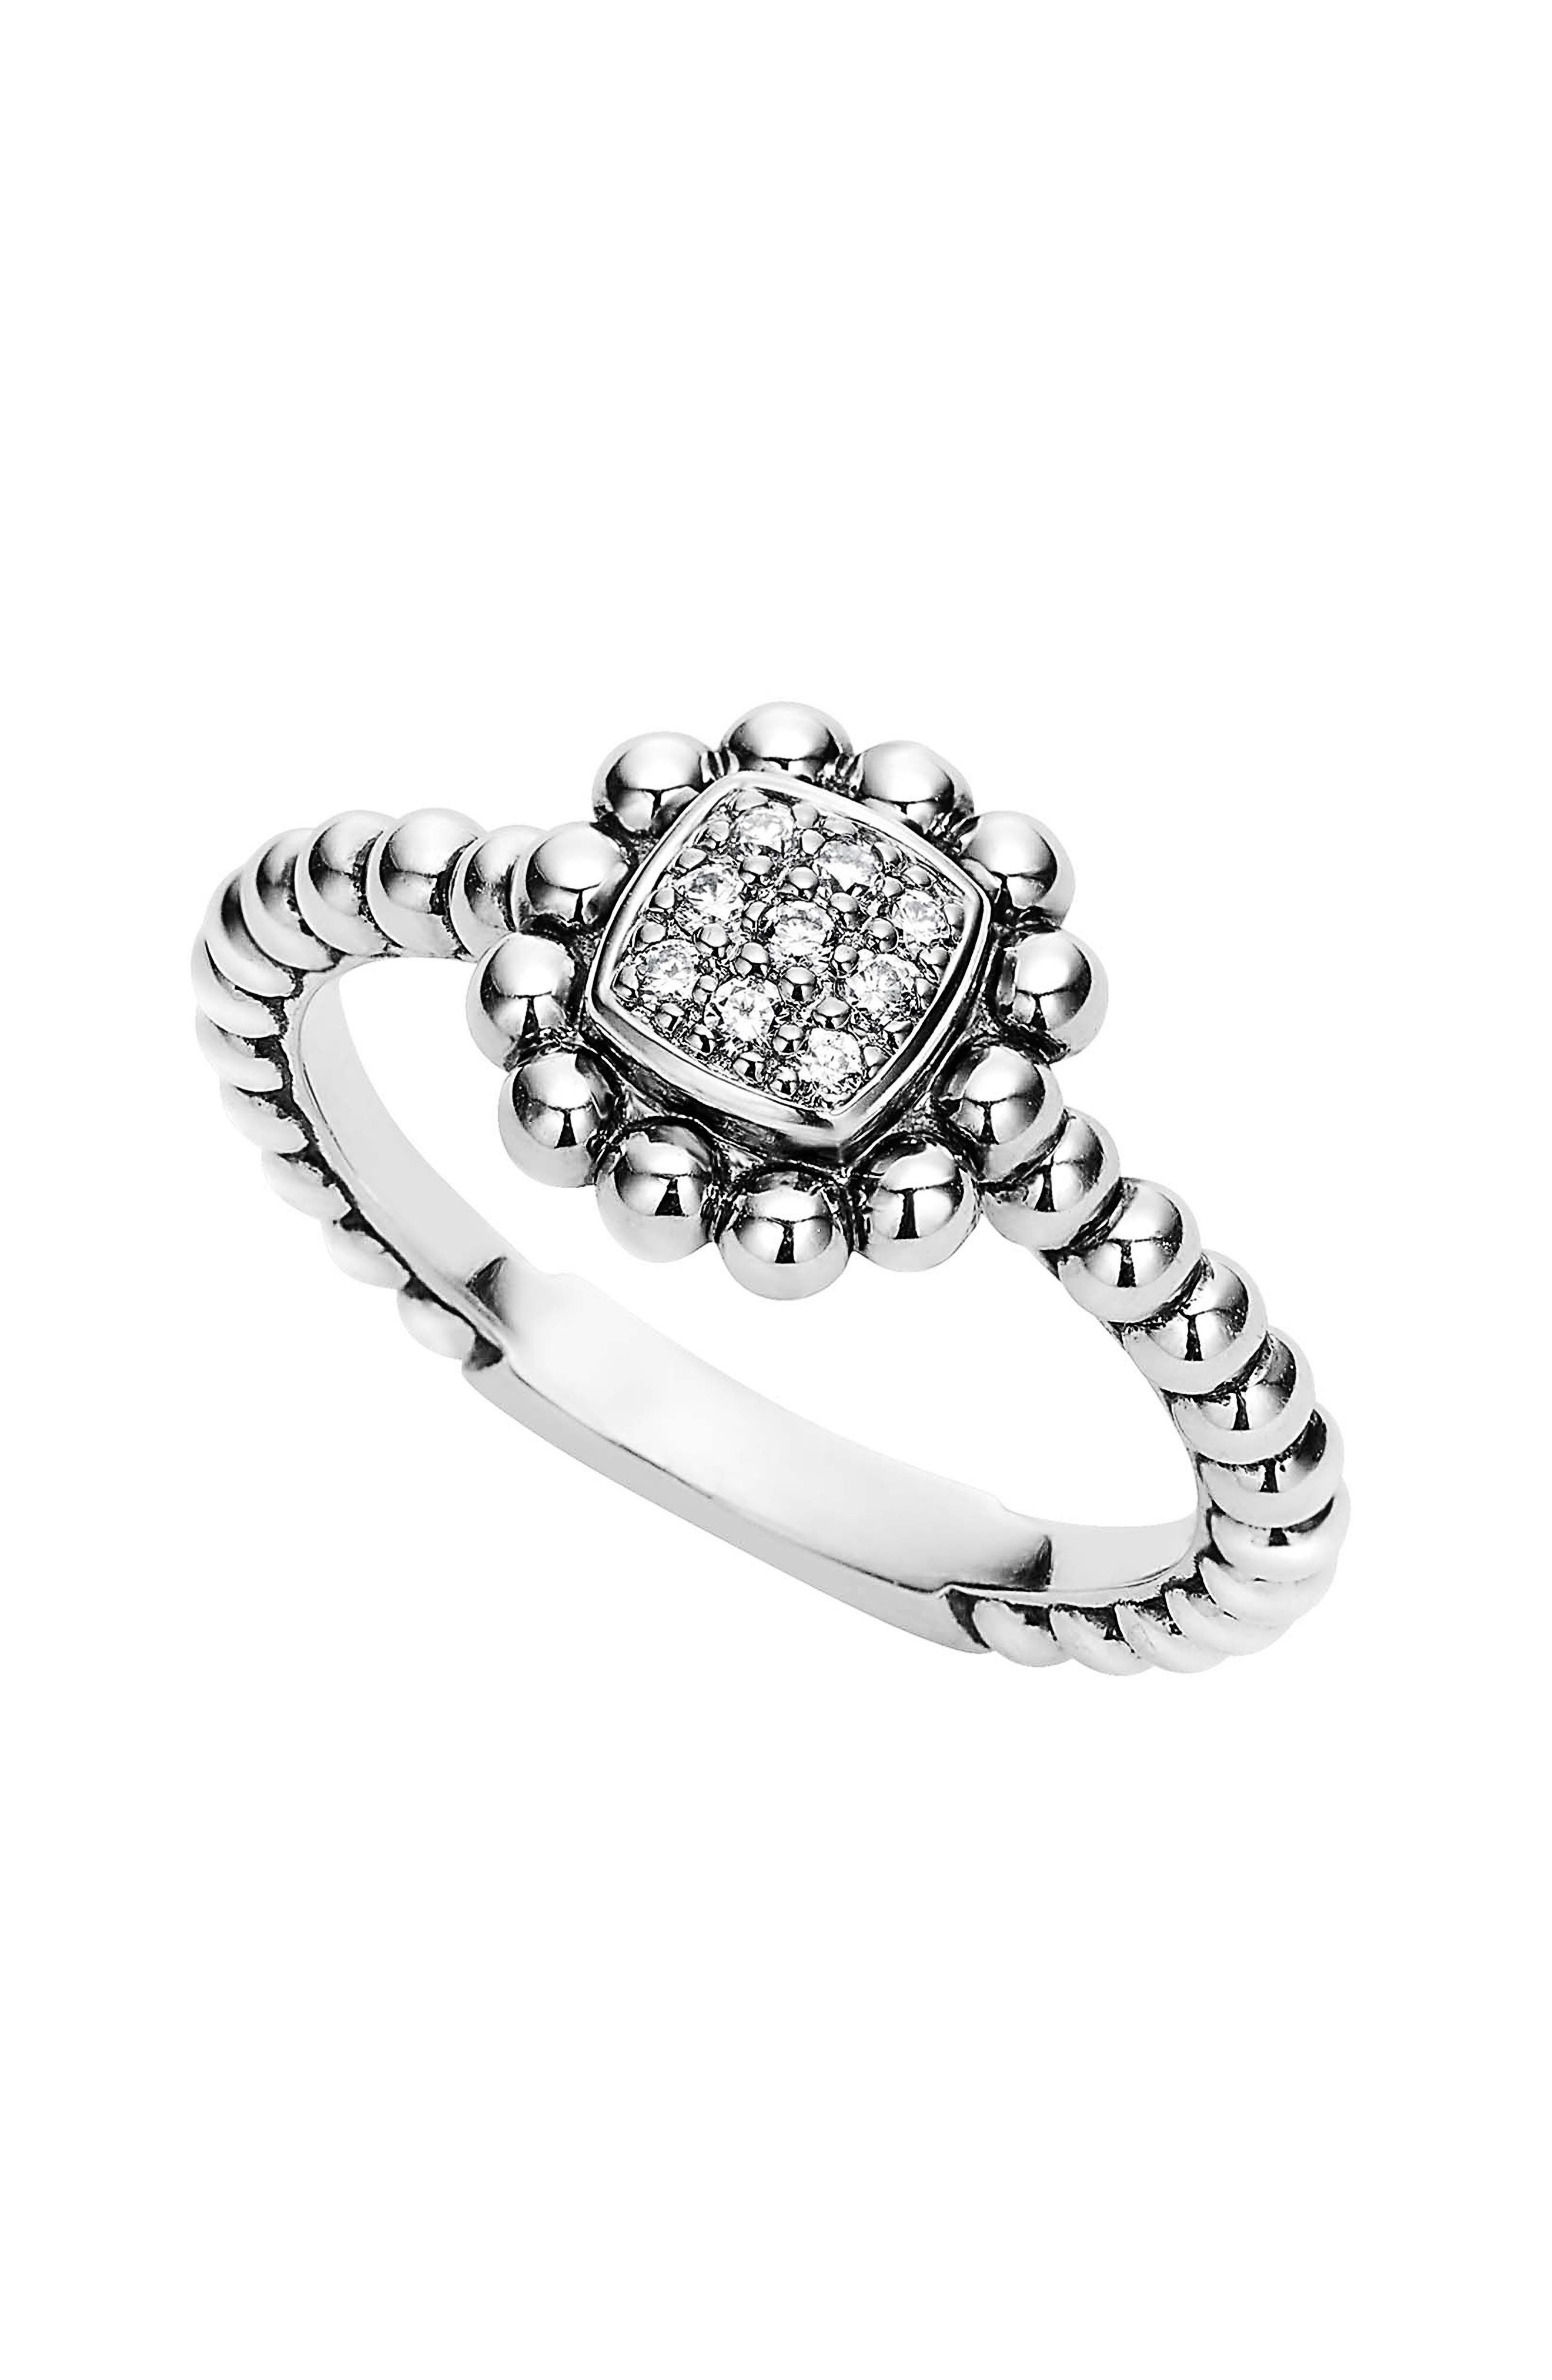 Caviar Spark Diamond Square Ring,                             Main thumbnail 1, color,                             SILVER/ DIAMOND